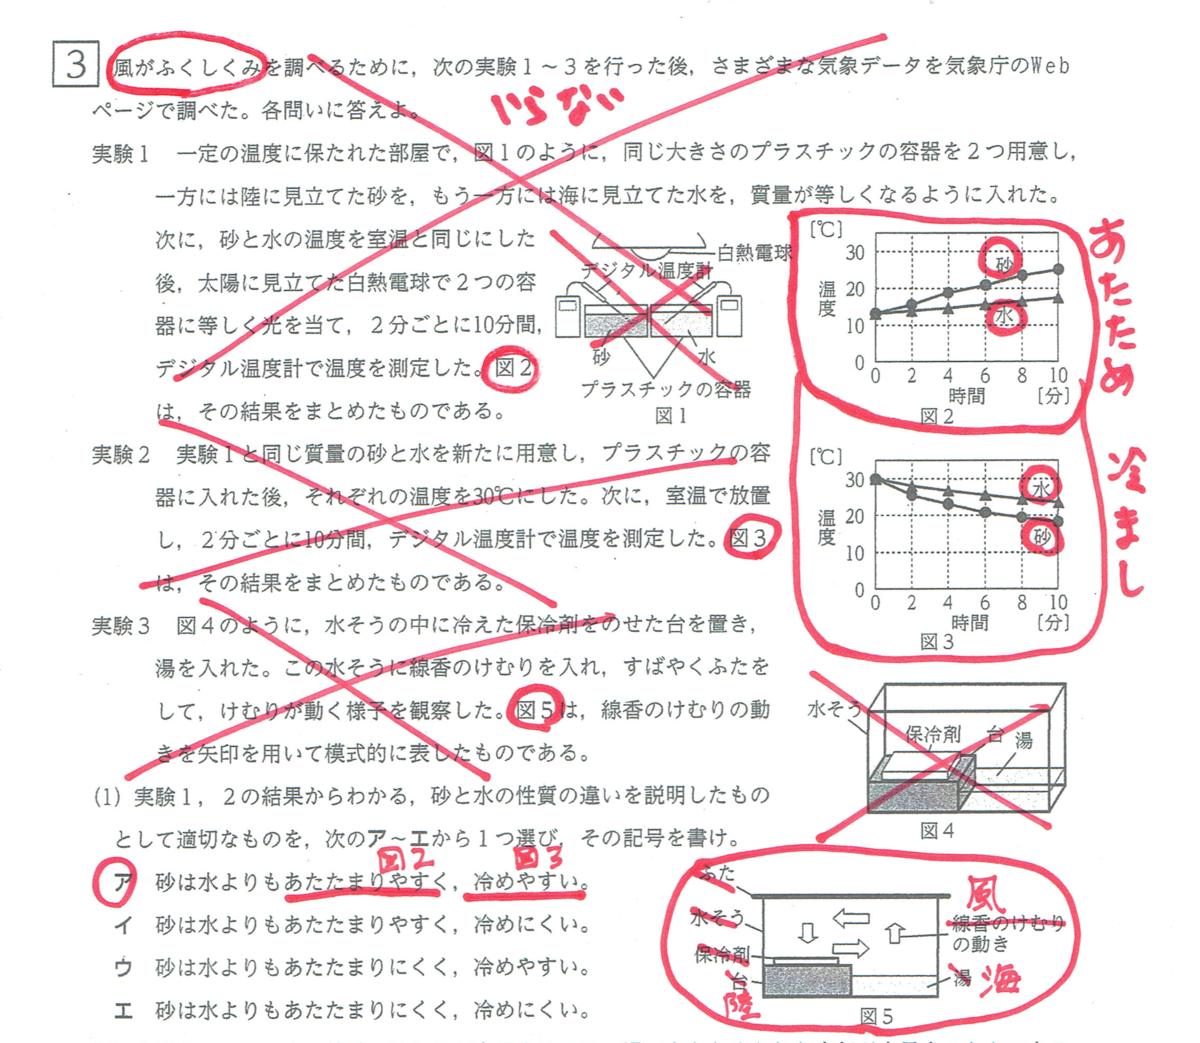 f:id:shusensei:20200414230802p:plain